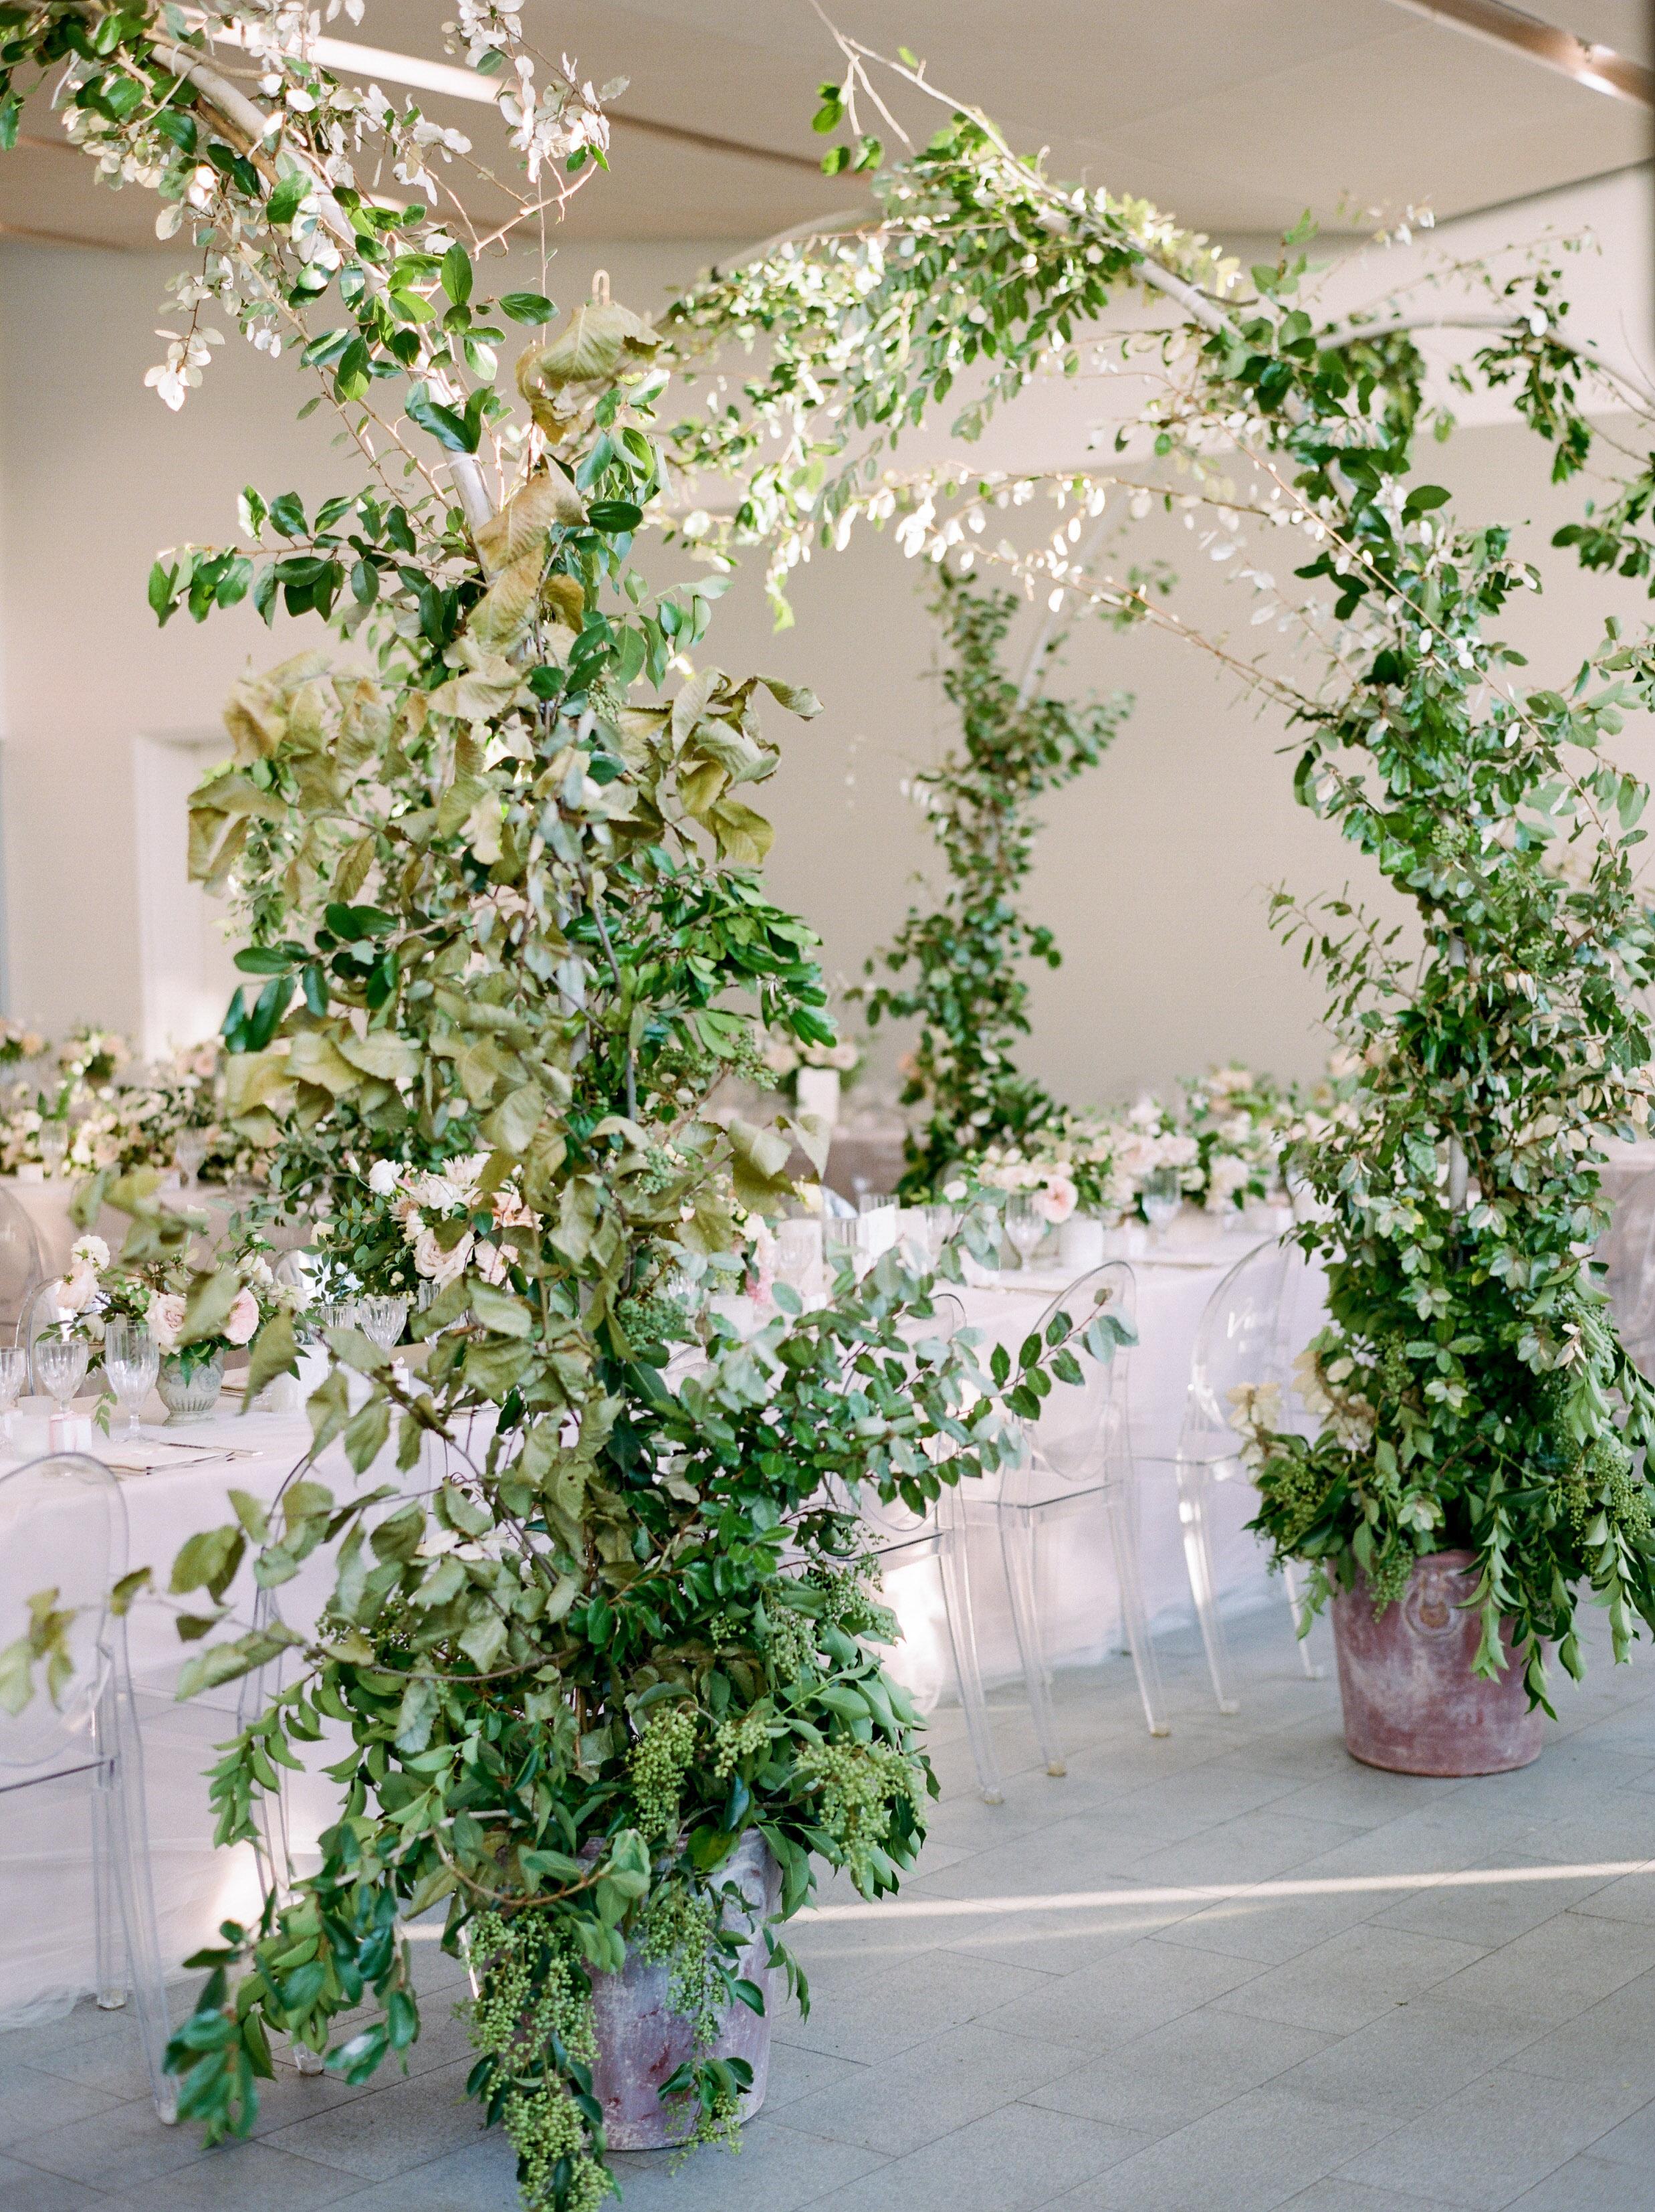 Martha-Stewart-Wedding-Dana-Fernandez-Photography-Josh-Texas-Film-Houston-Wedding-Fine-Art-Photographer-McGovern-Centennial-Gardens-Top-Best-198.jpg